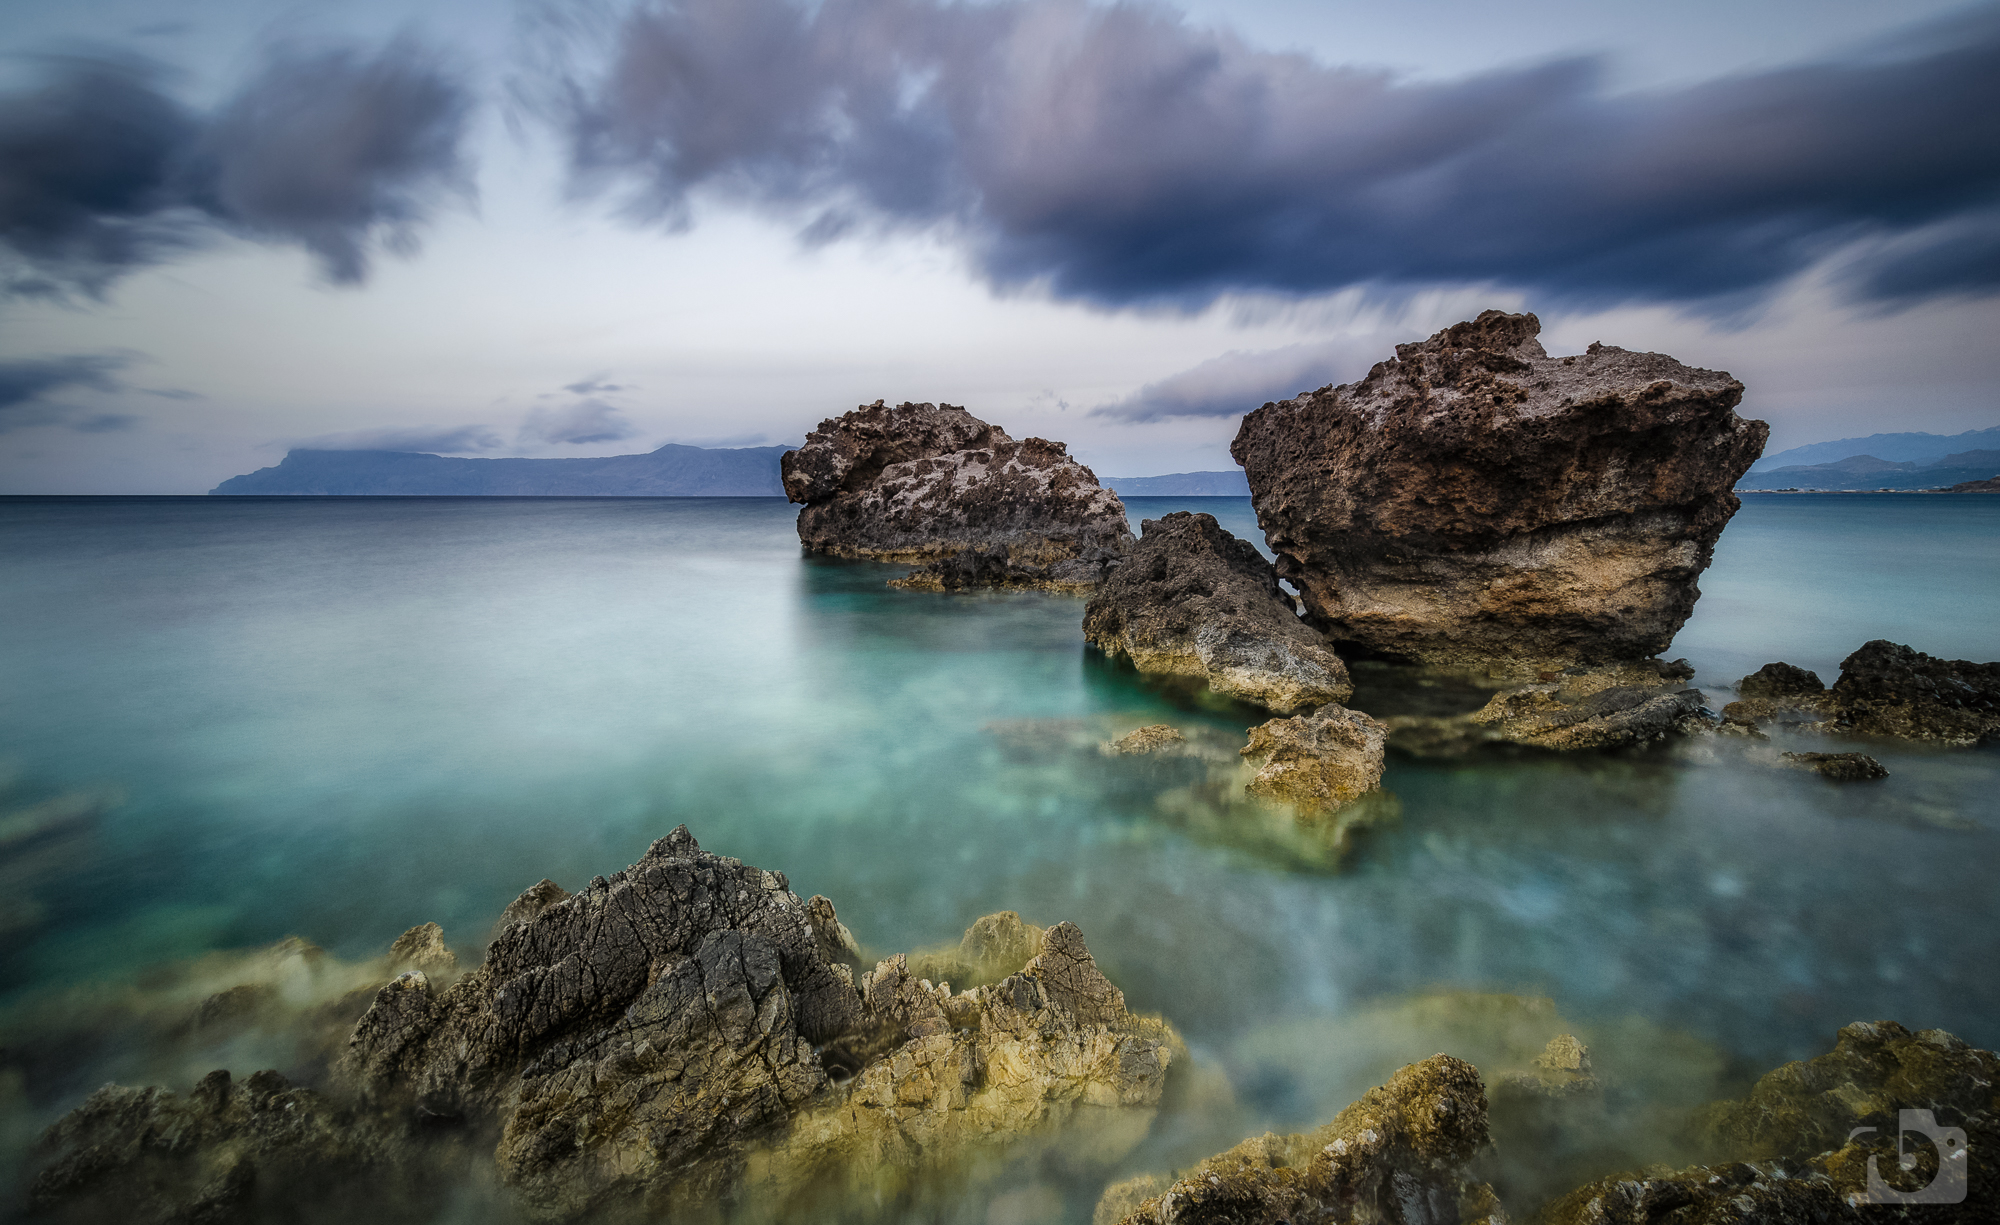 Bay of Kissamos, Greece